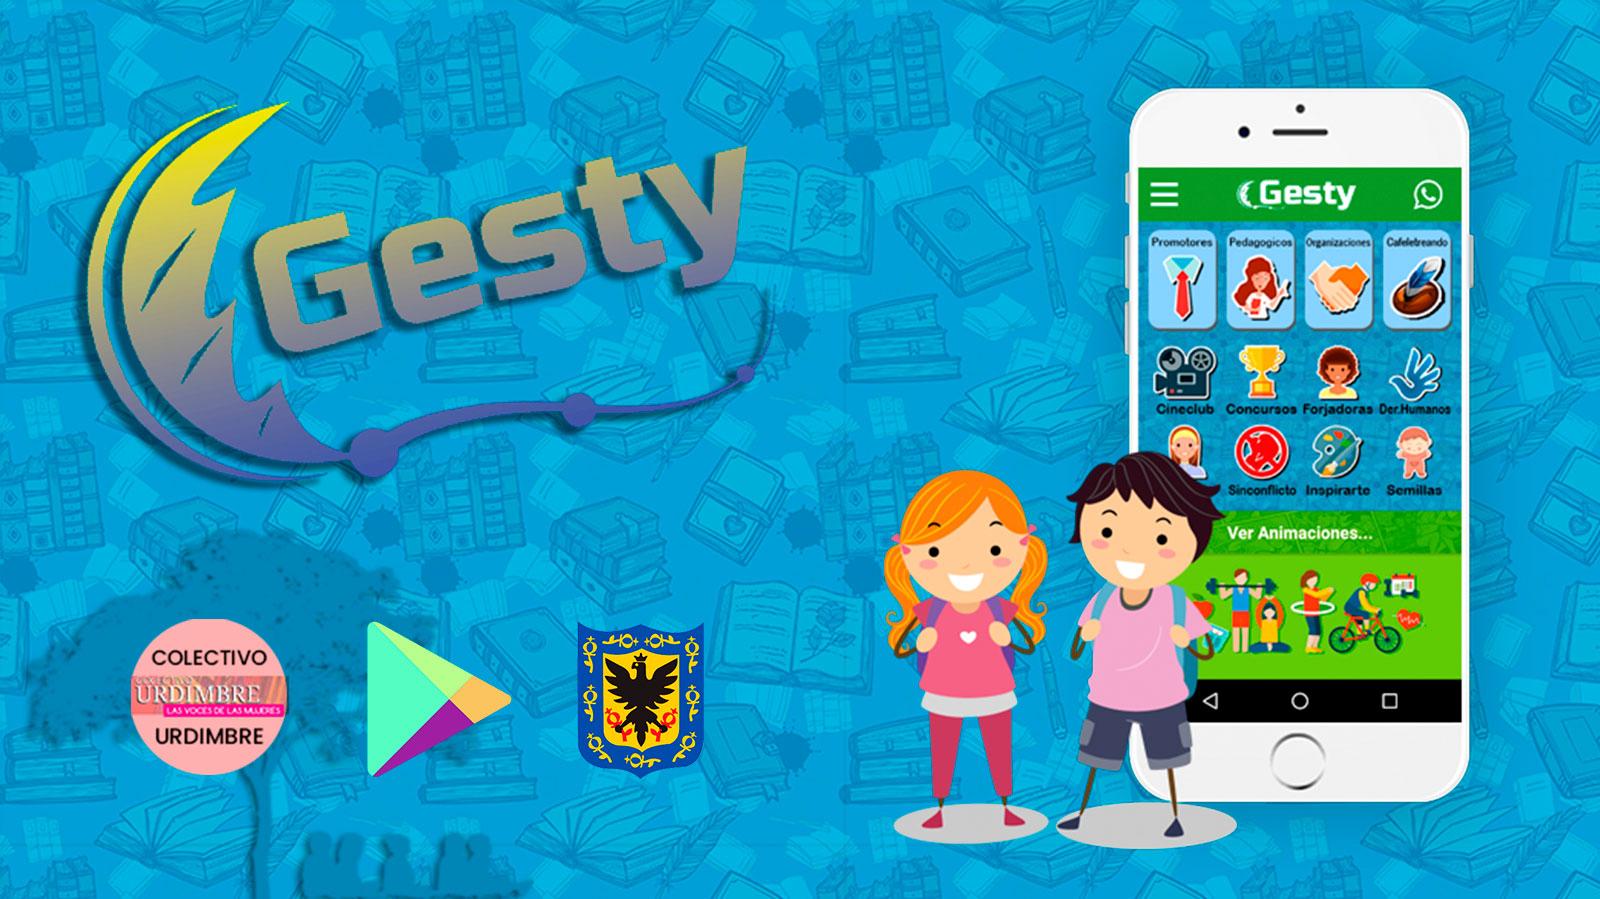 Gesty Mobile App